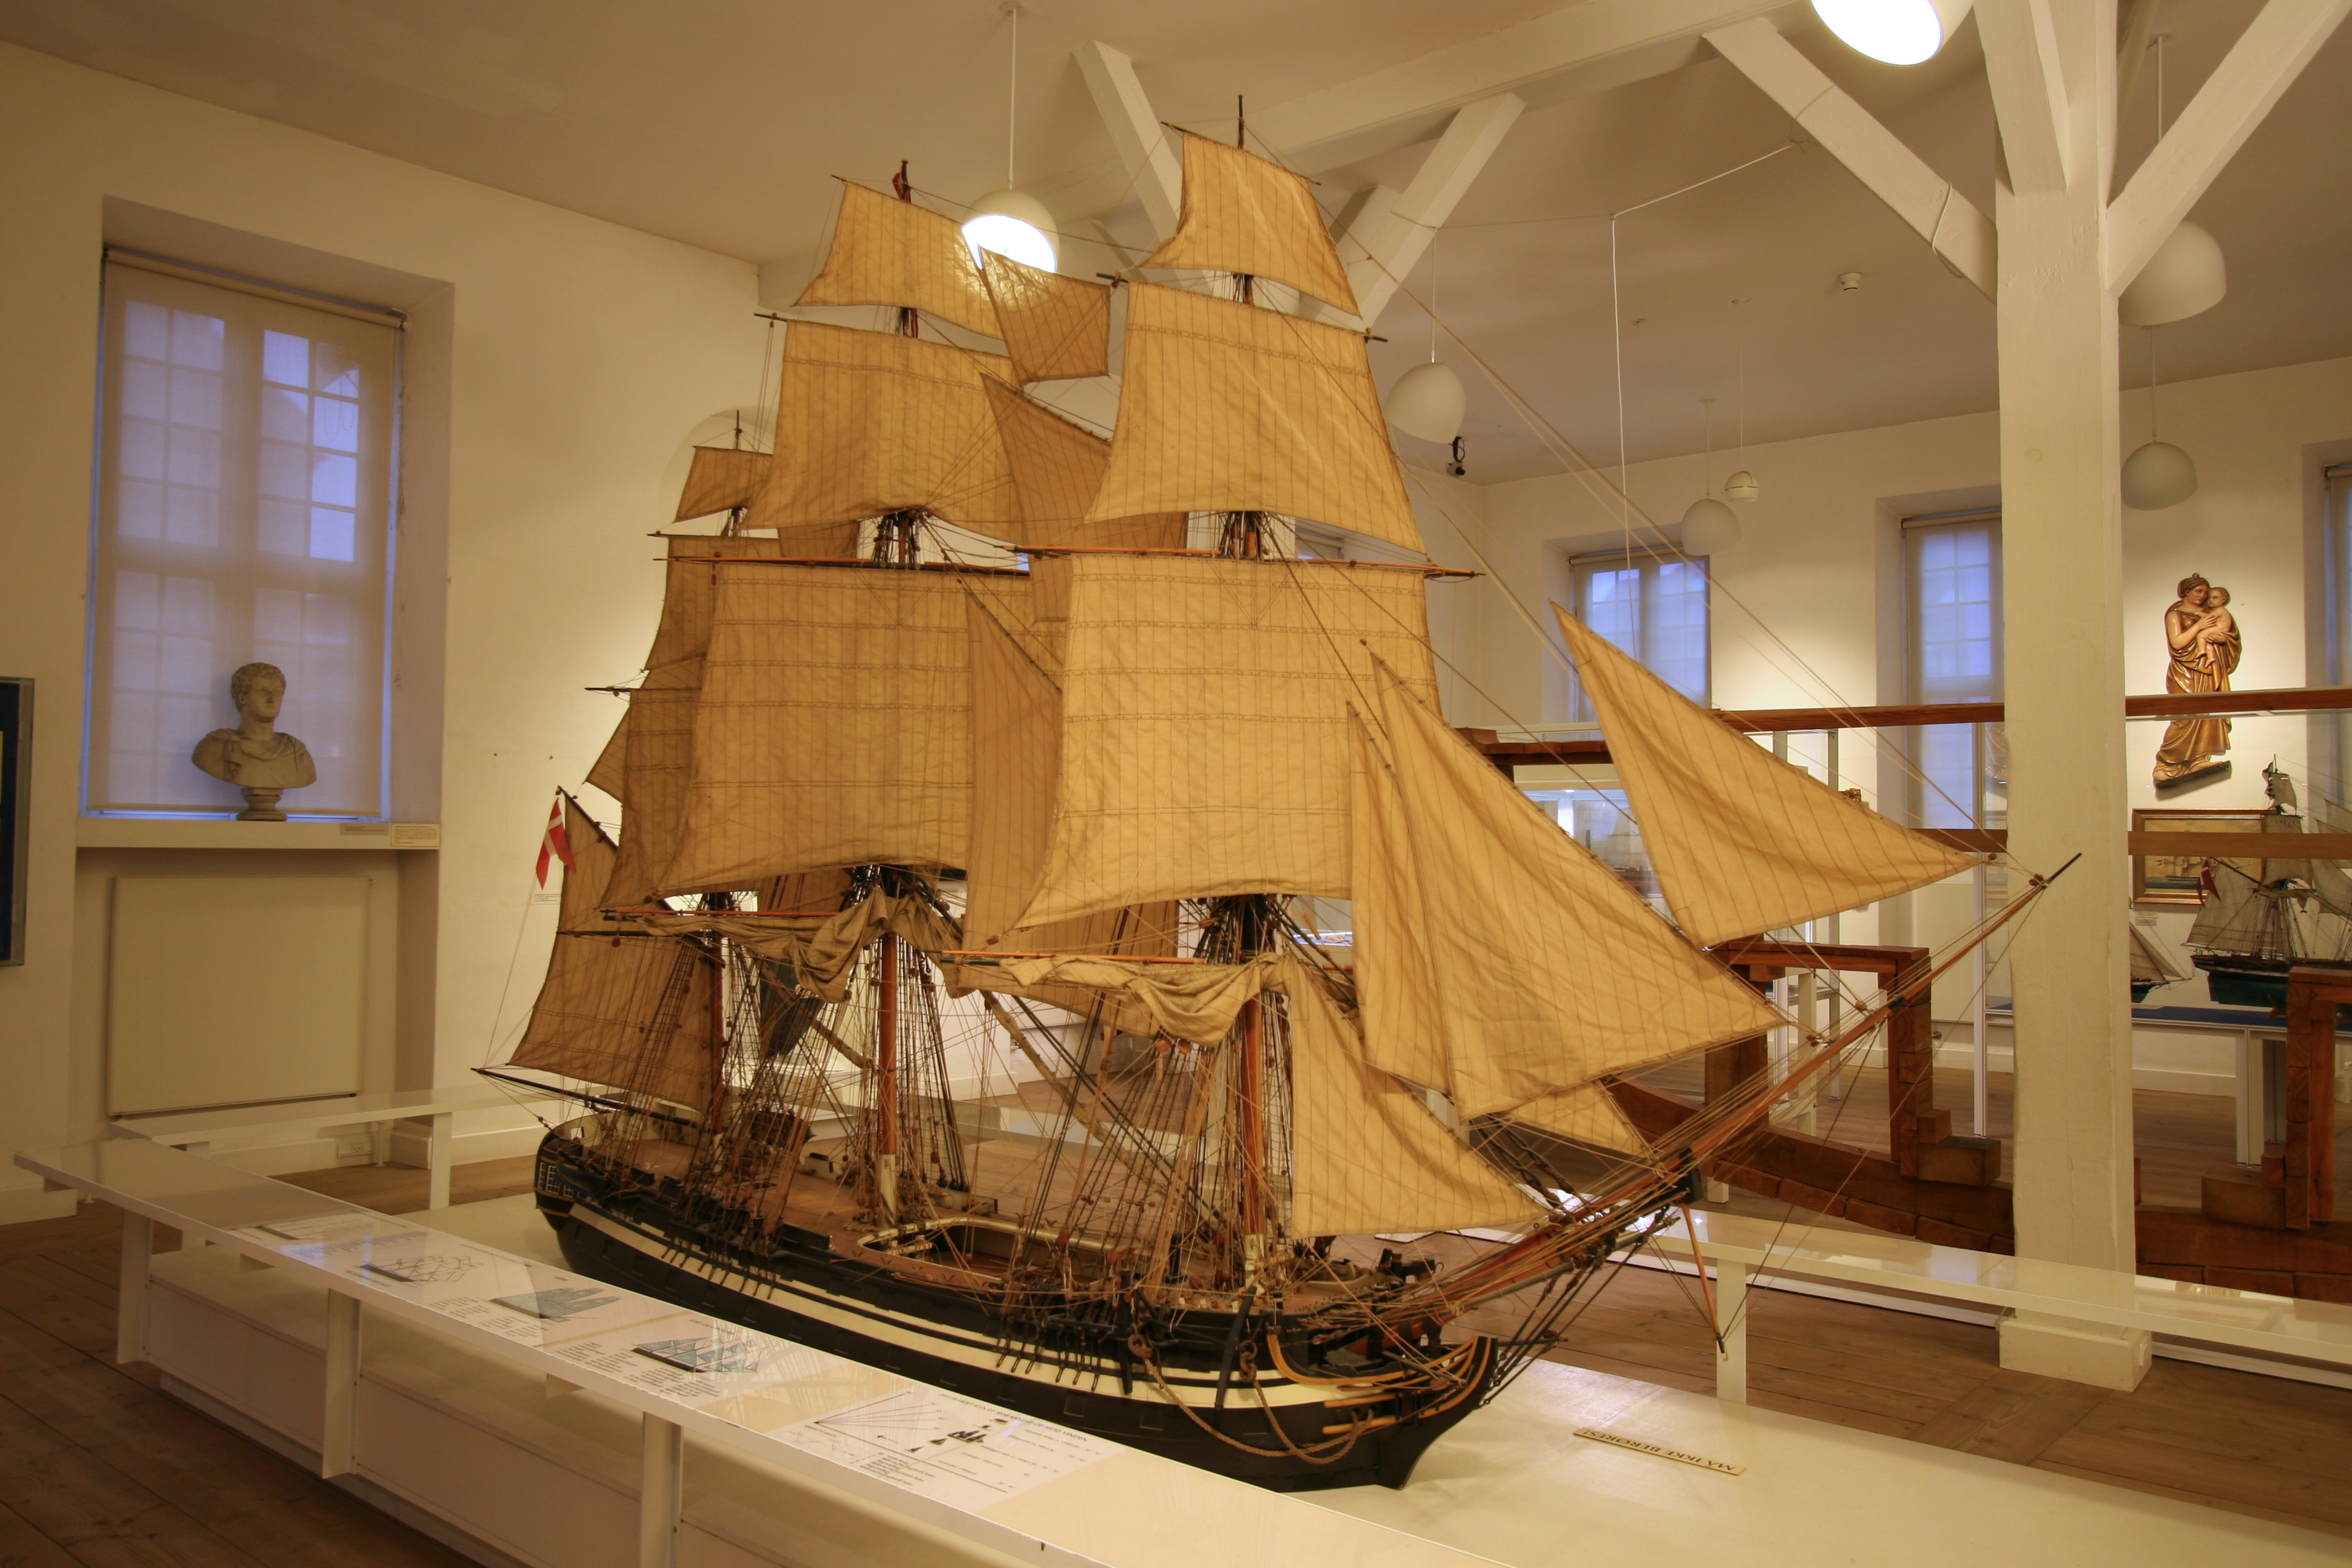 Orlogsmuseet Copenhagen gamle overtro